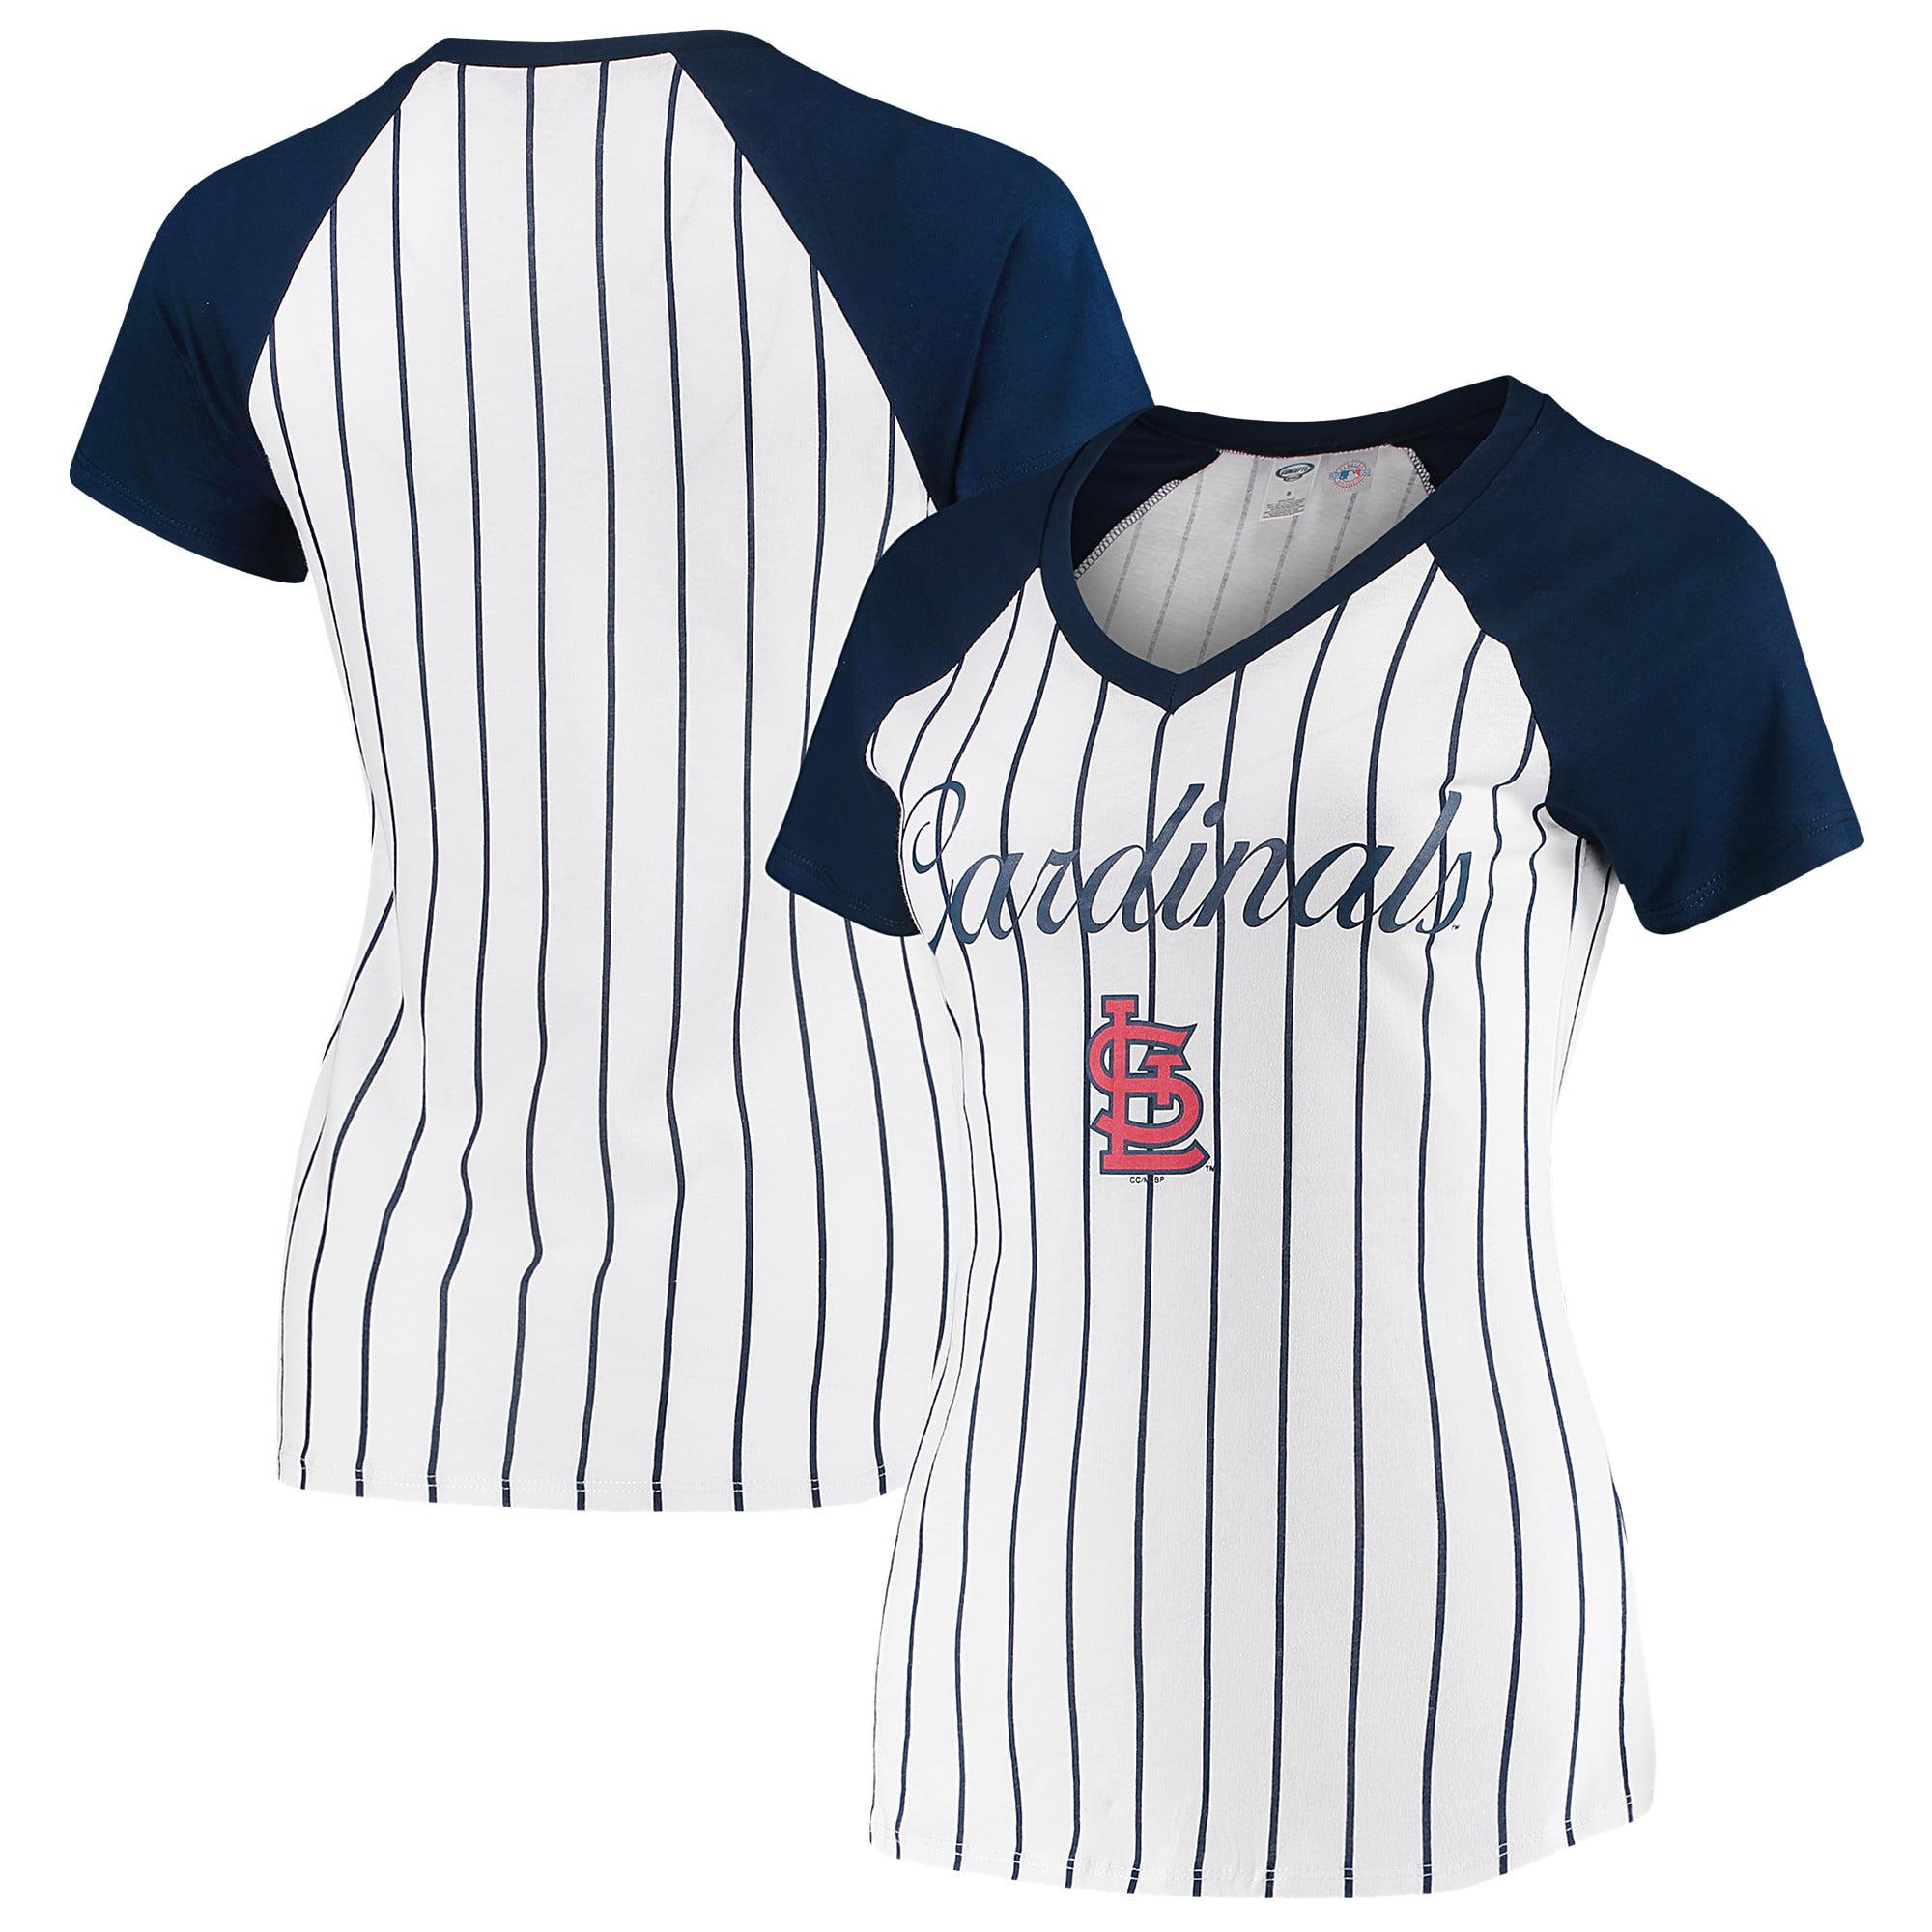 St. Louis Cardinals Concepts Sport Women's Vigor Pinstripe T-Shirt - White/Navy